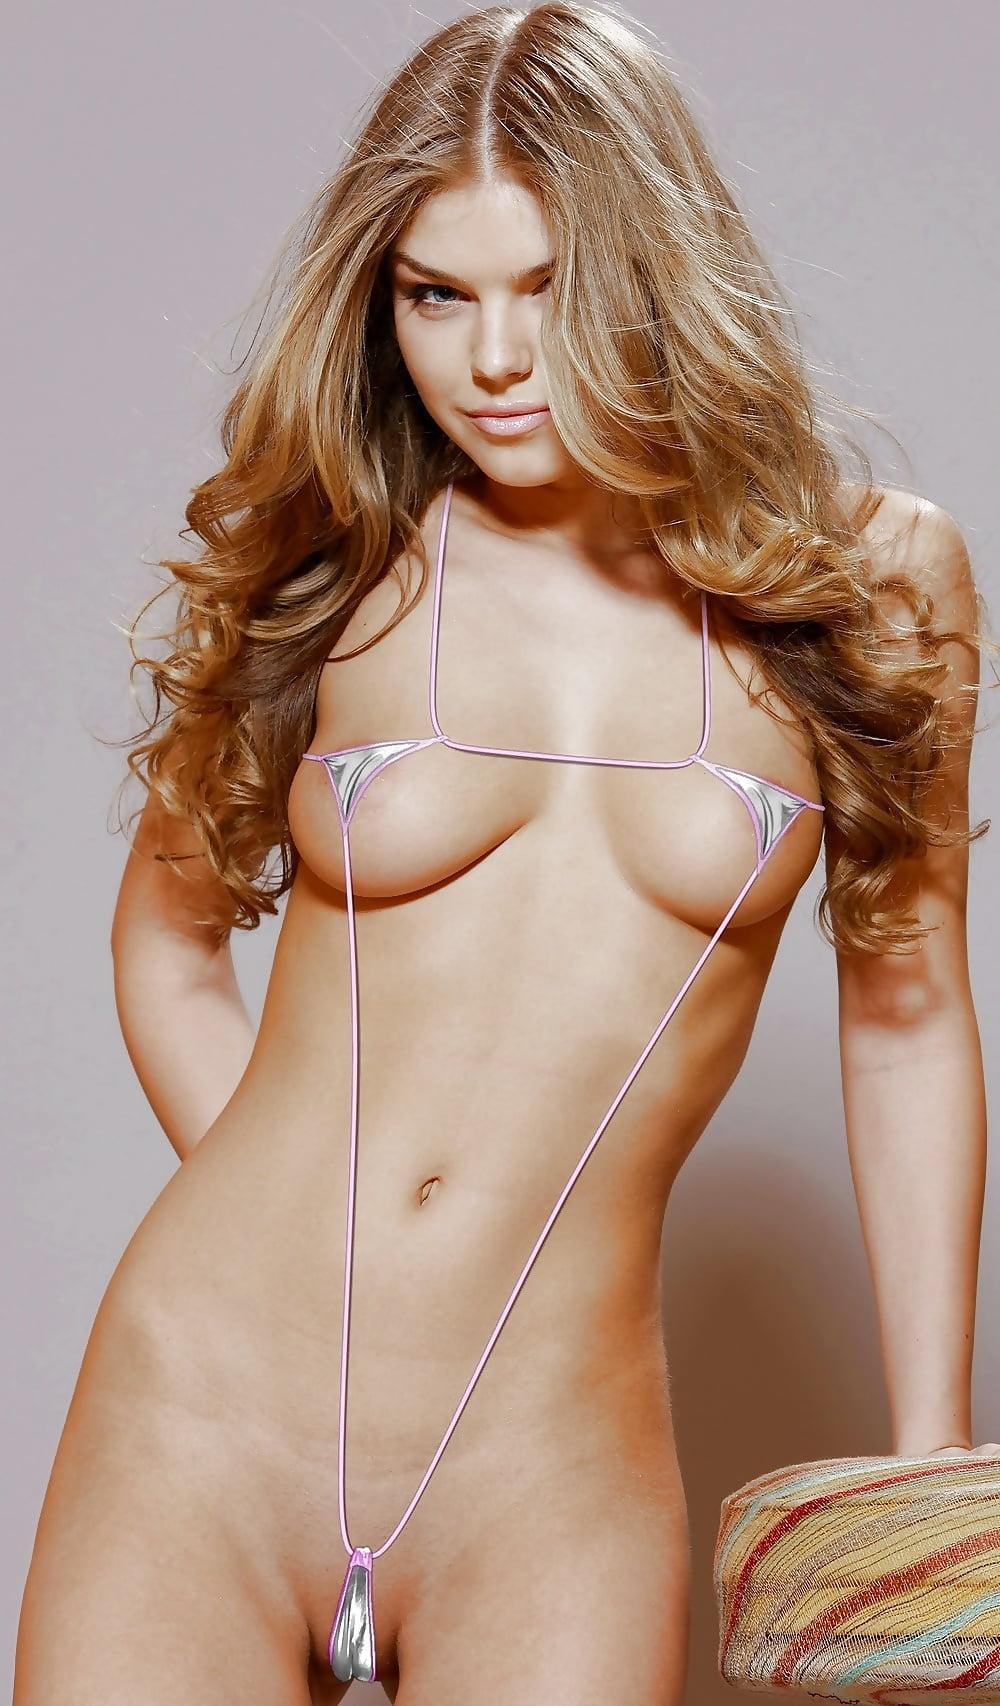 microkini-world-nude-sexy-nude-girl-lifeguards-nude